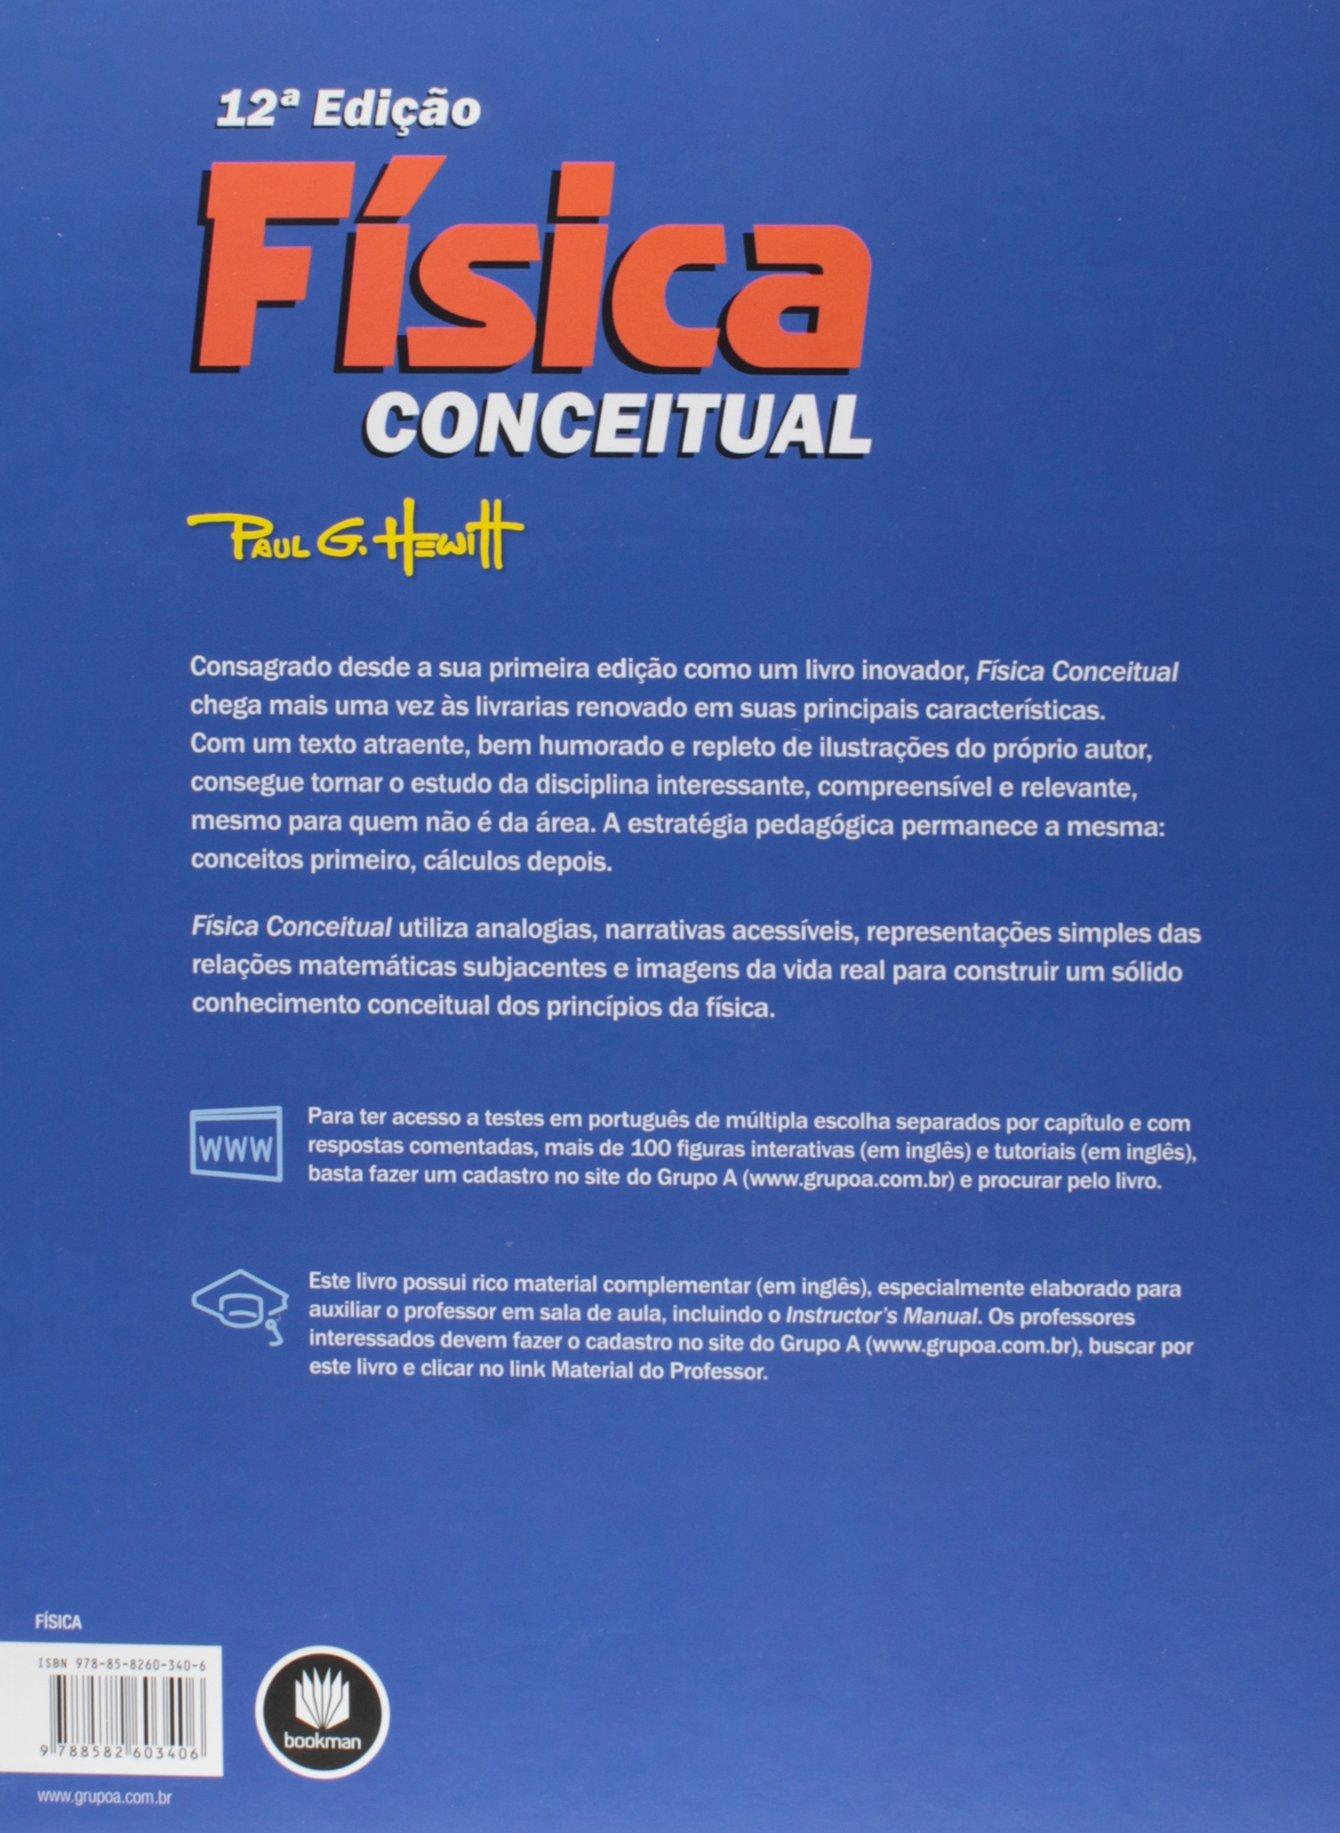 FISICA CONCEITUAL EPUB